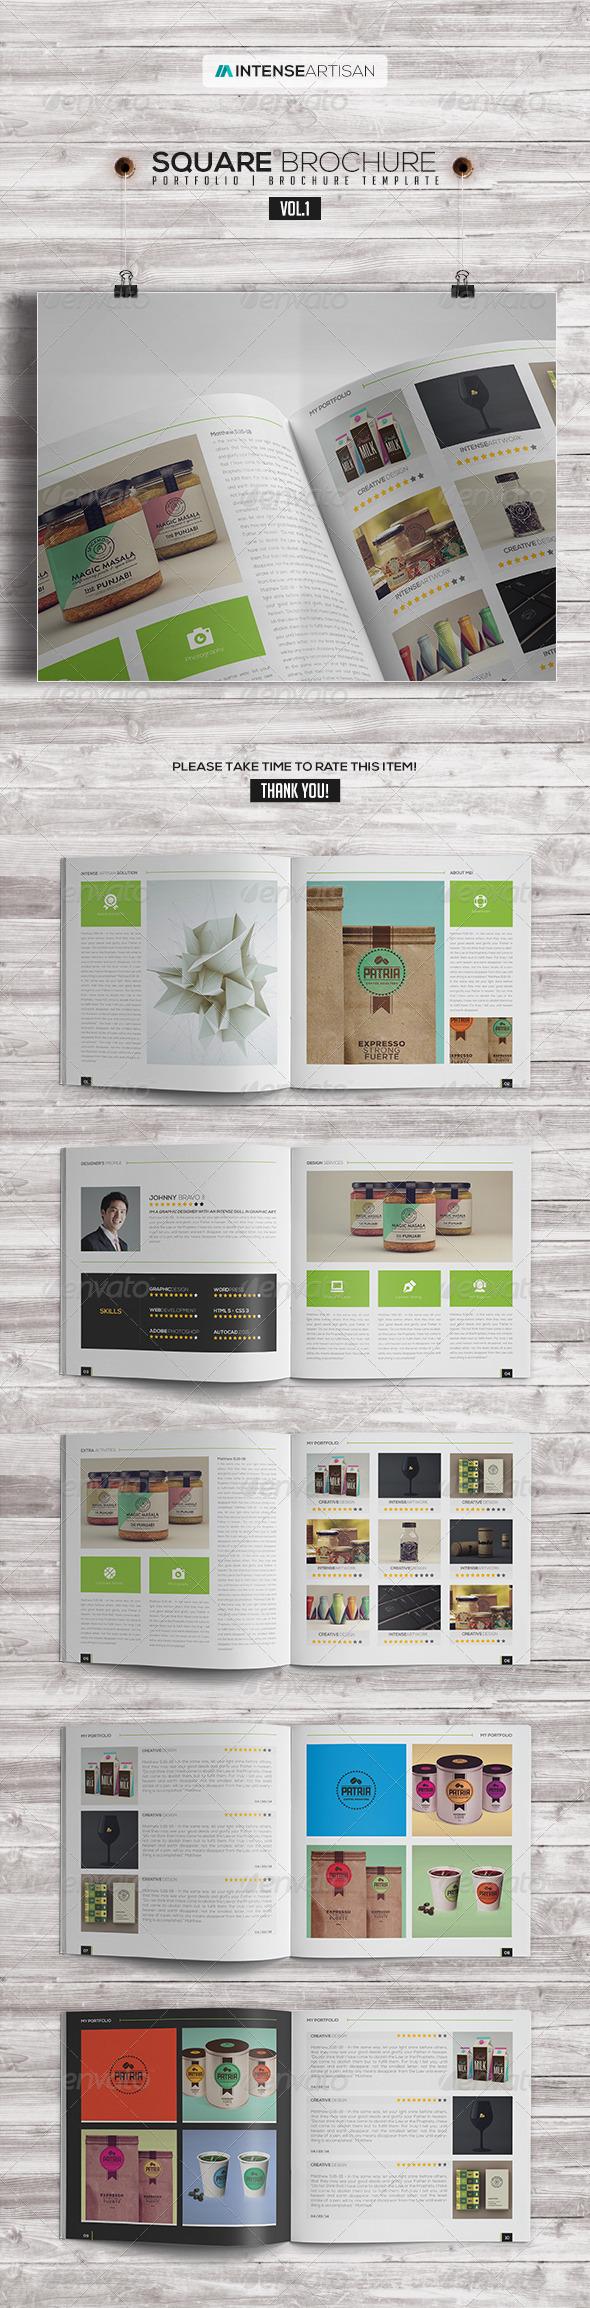 Square Brochure - Portfolio Vol.1 - Portfolio Brochures